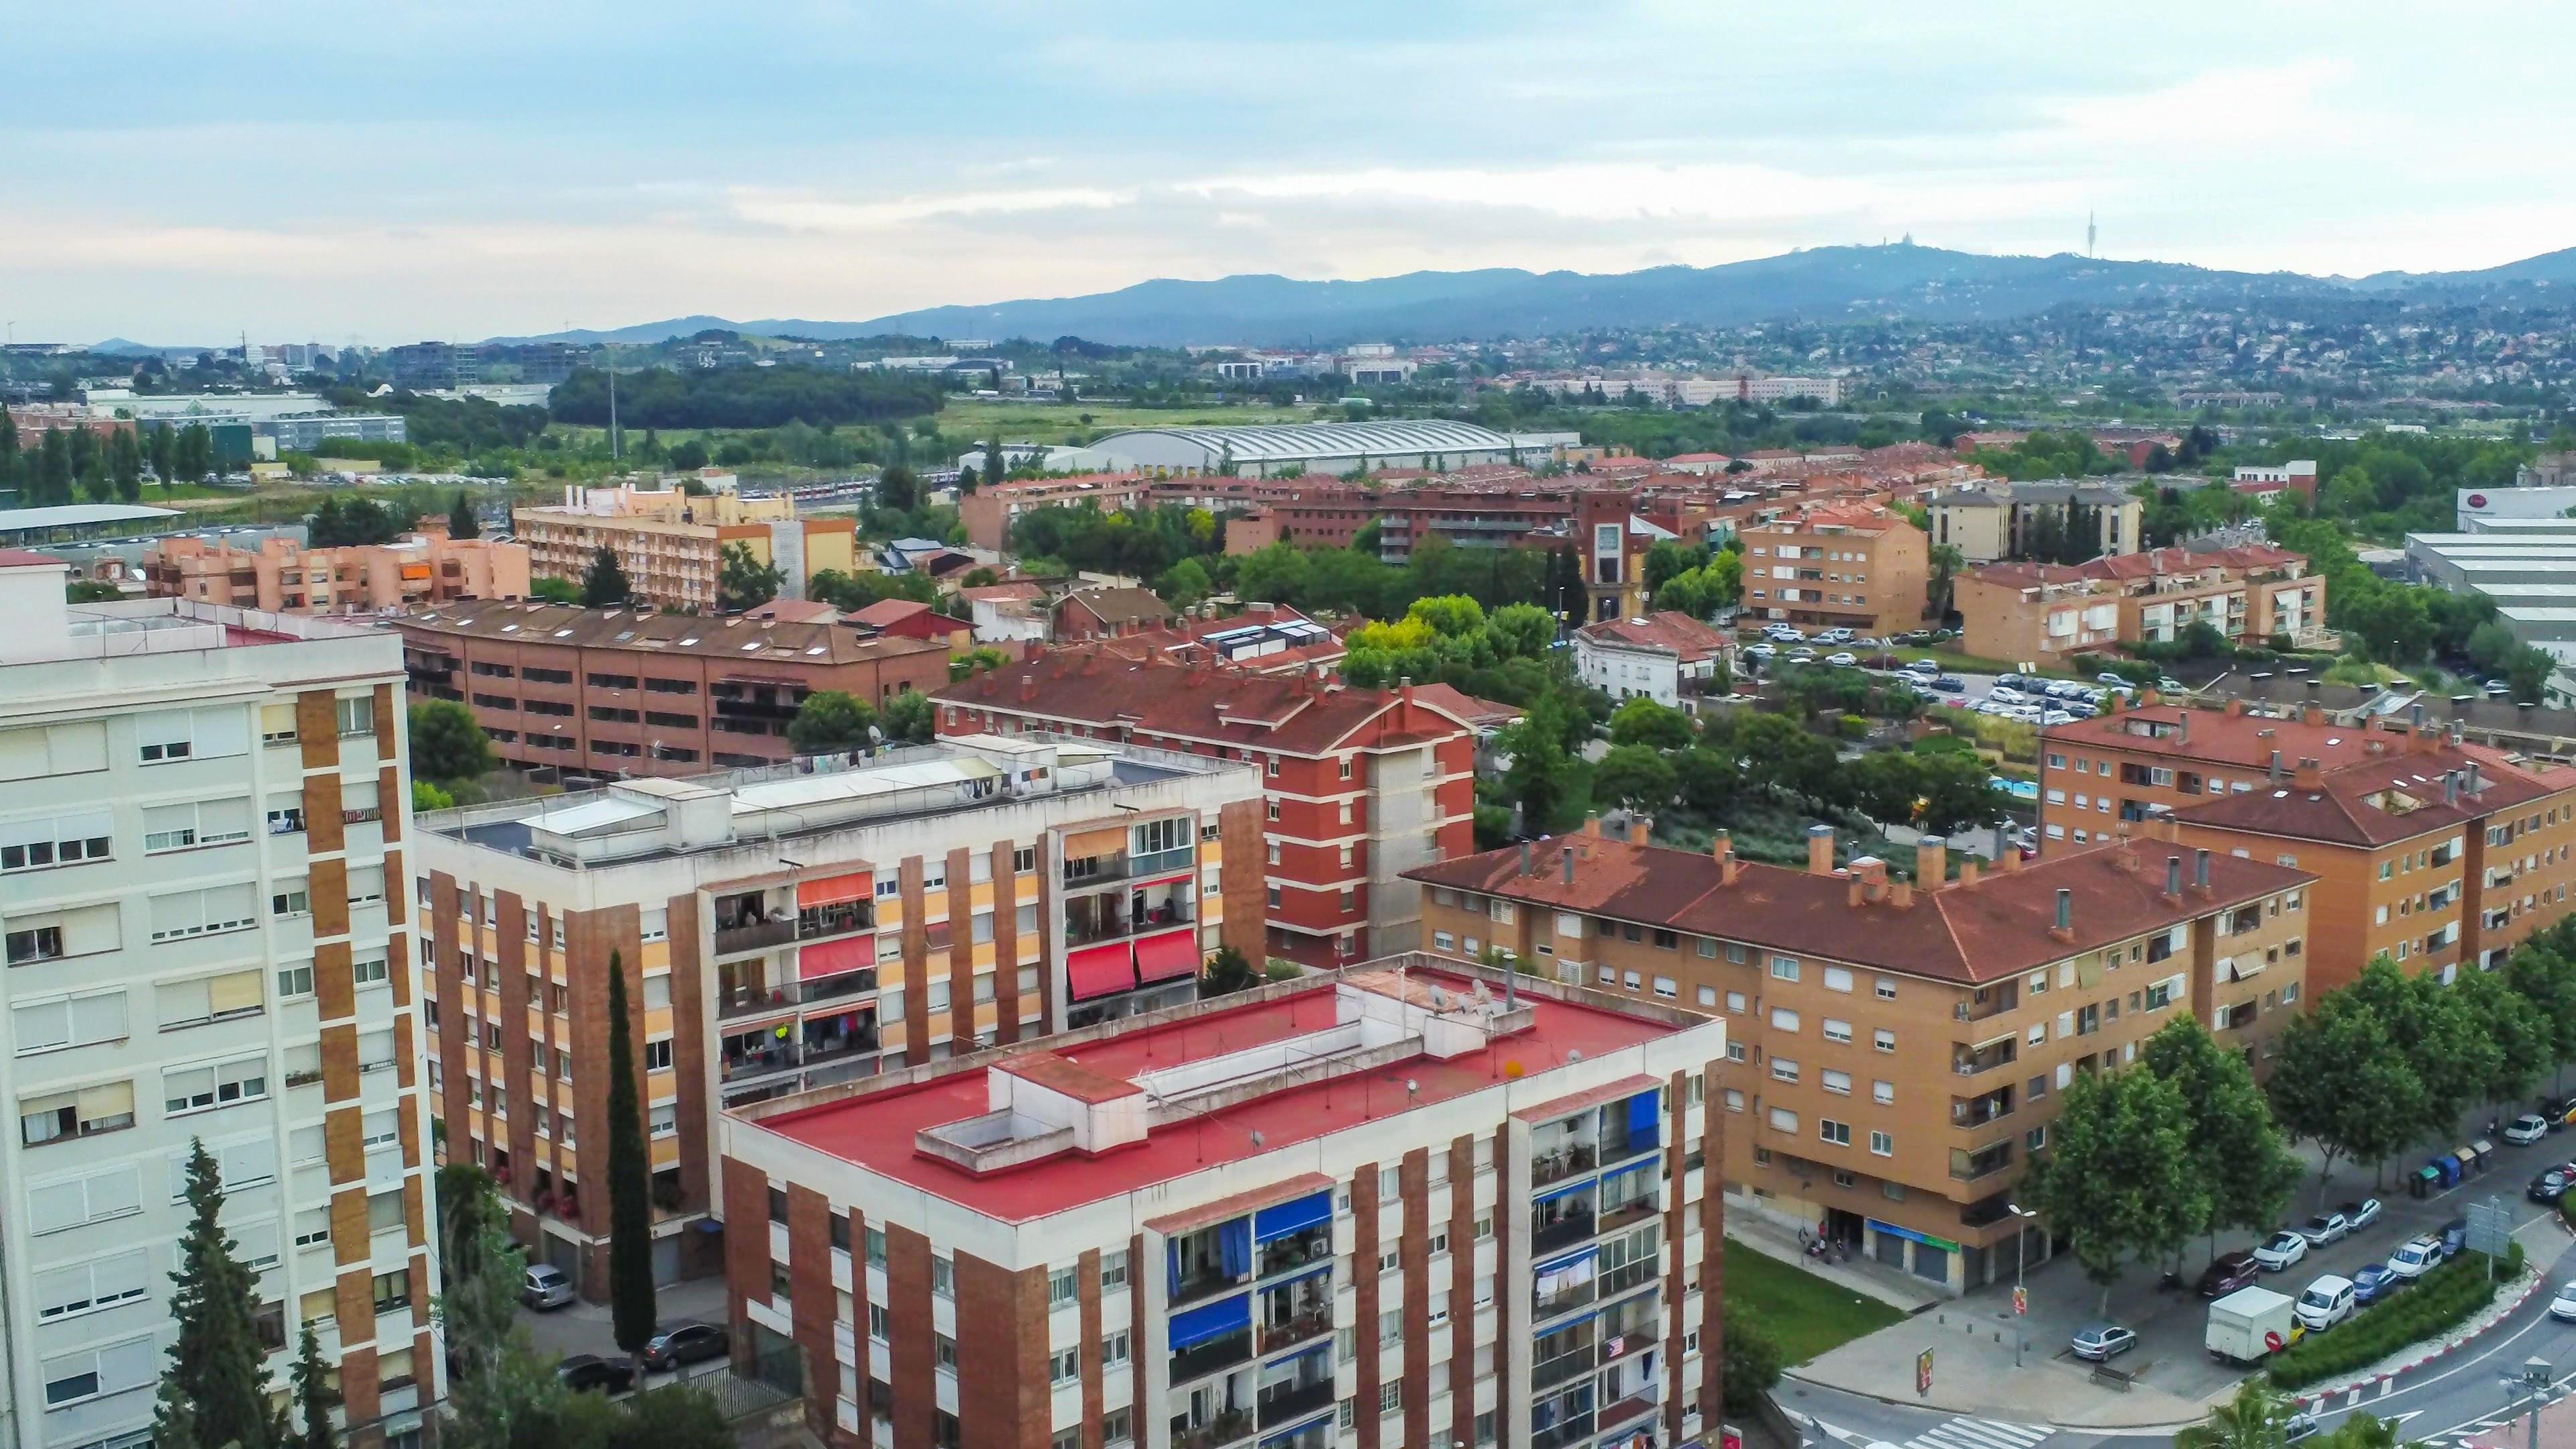 Rubi, Catalonia, Spain